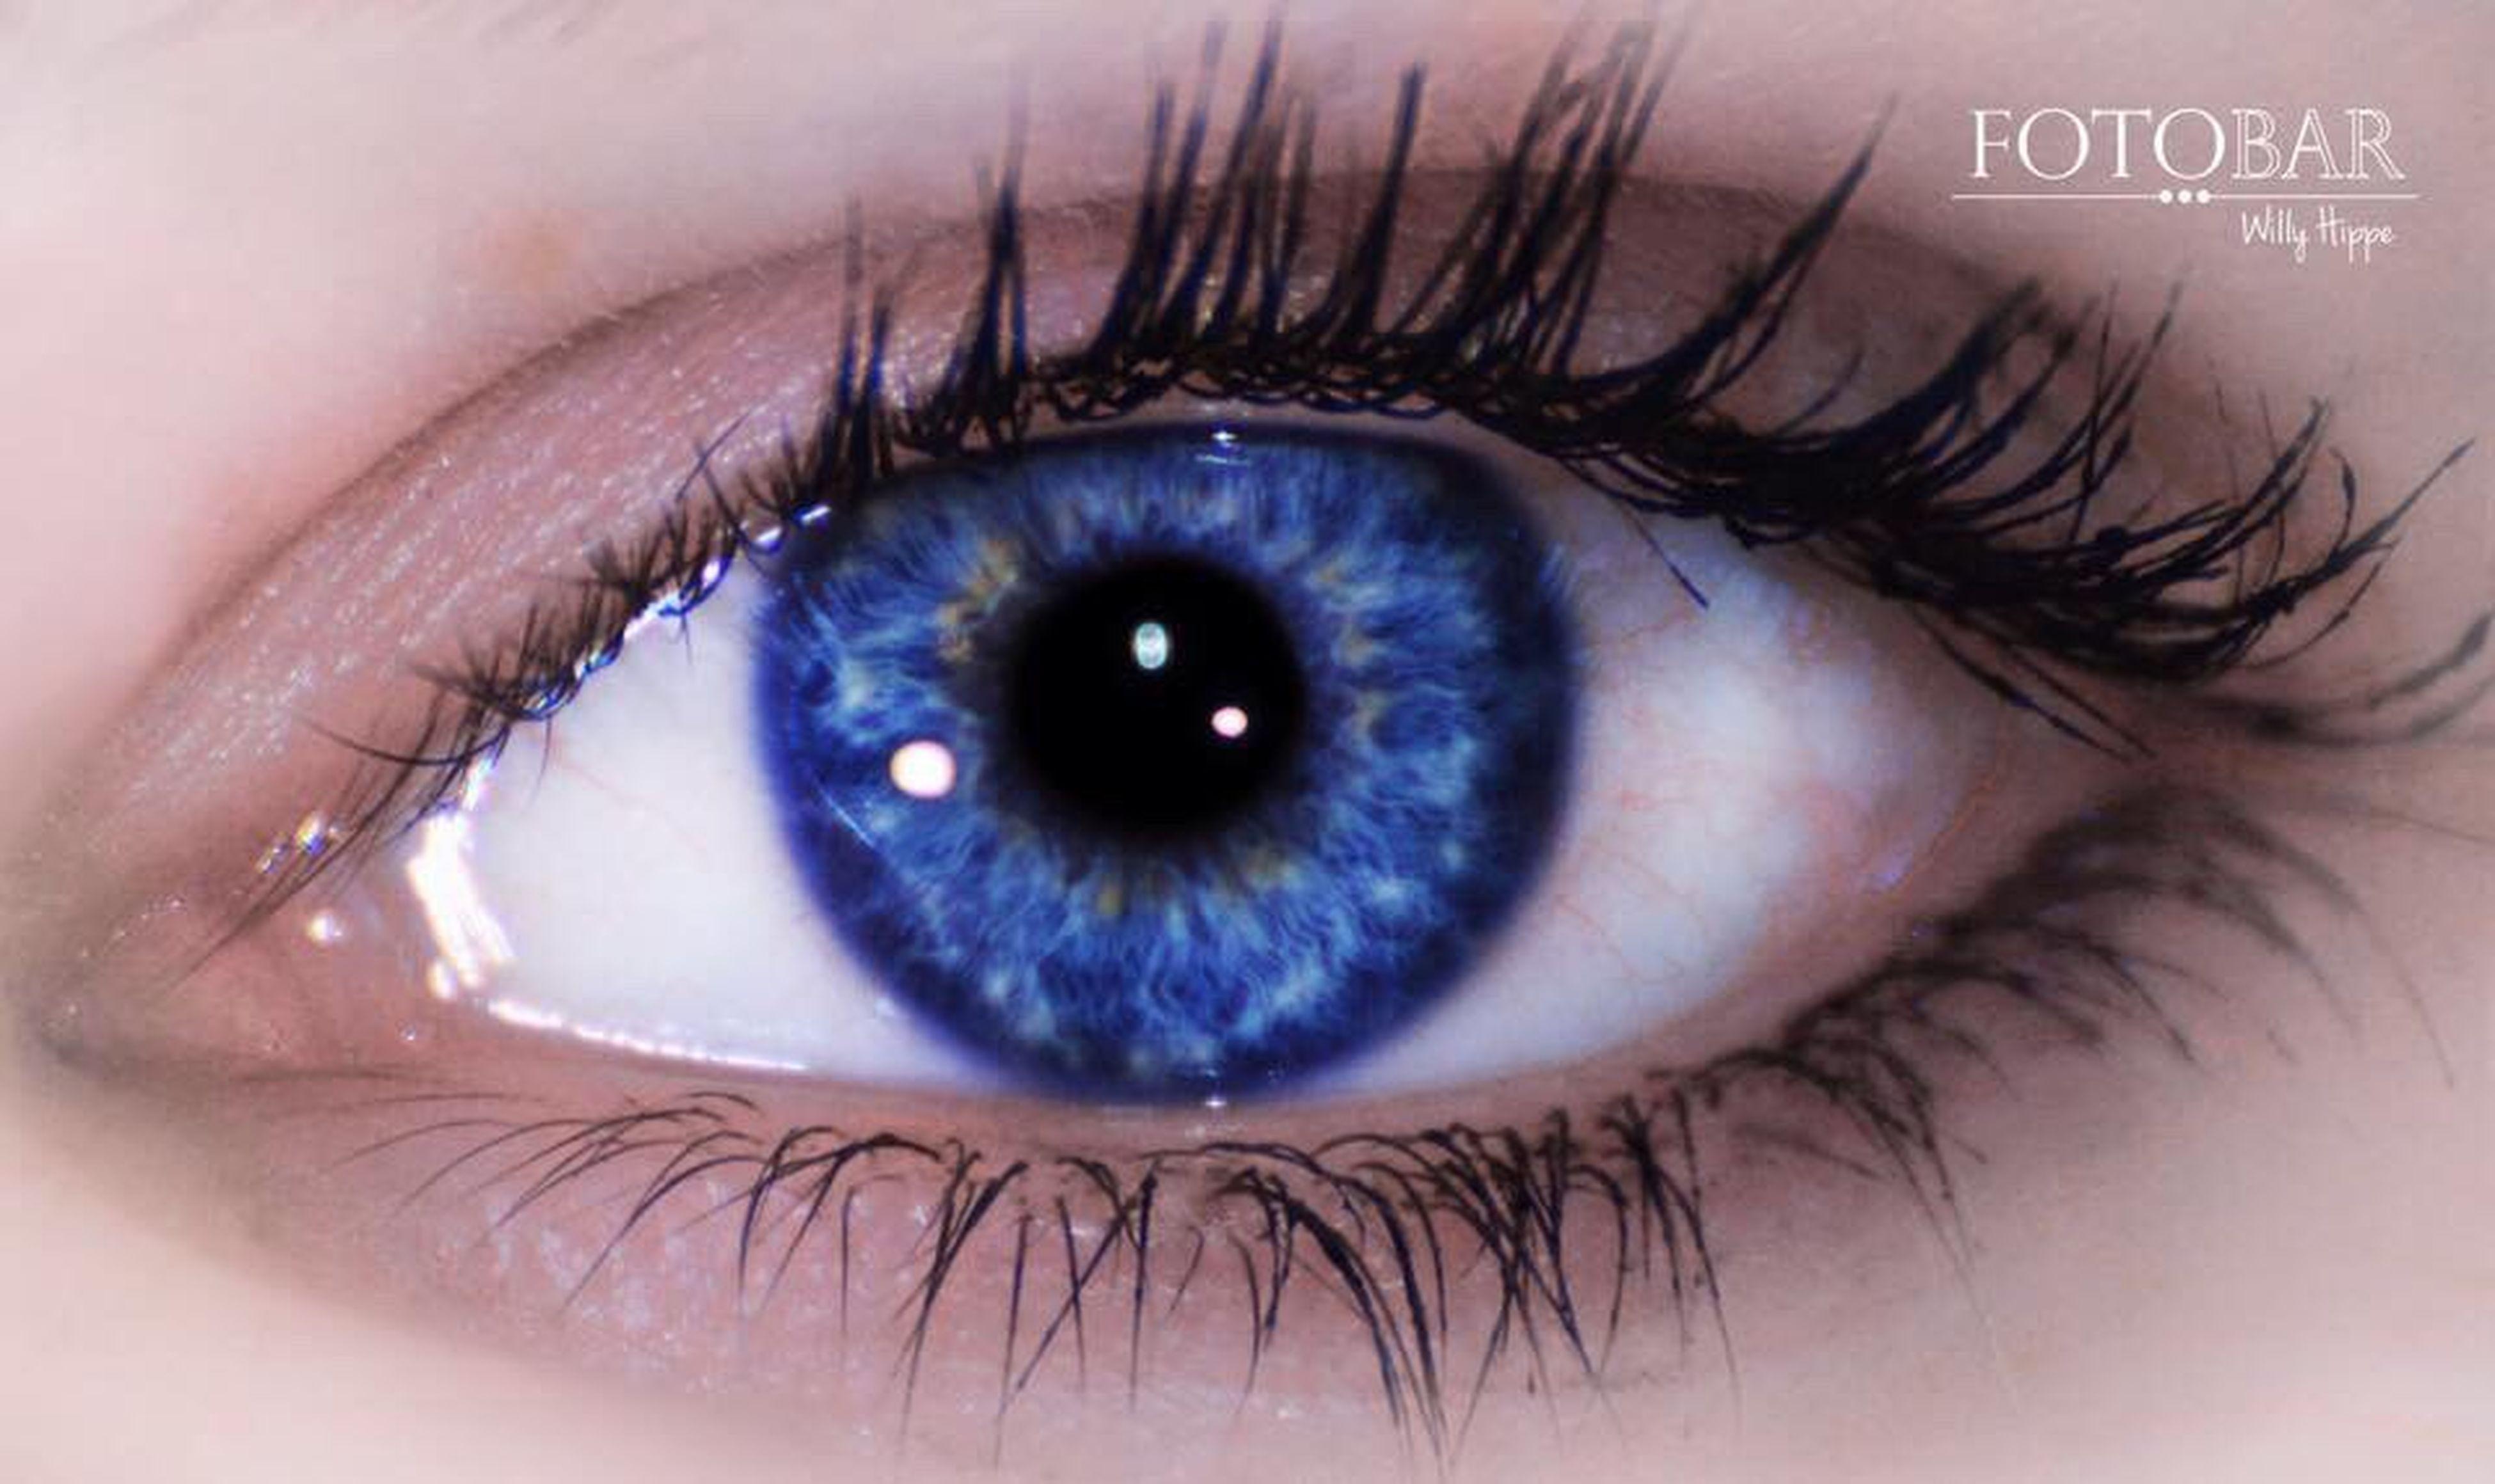 human eye, eyelash, close-up, eyesight, looking at camera, part of, sensory perception, portrait, eyeball, iris - eye, extreme close-up, human face, lifestyles, extreme close up, eyebrow, human skin, person